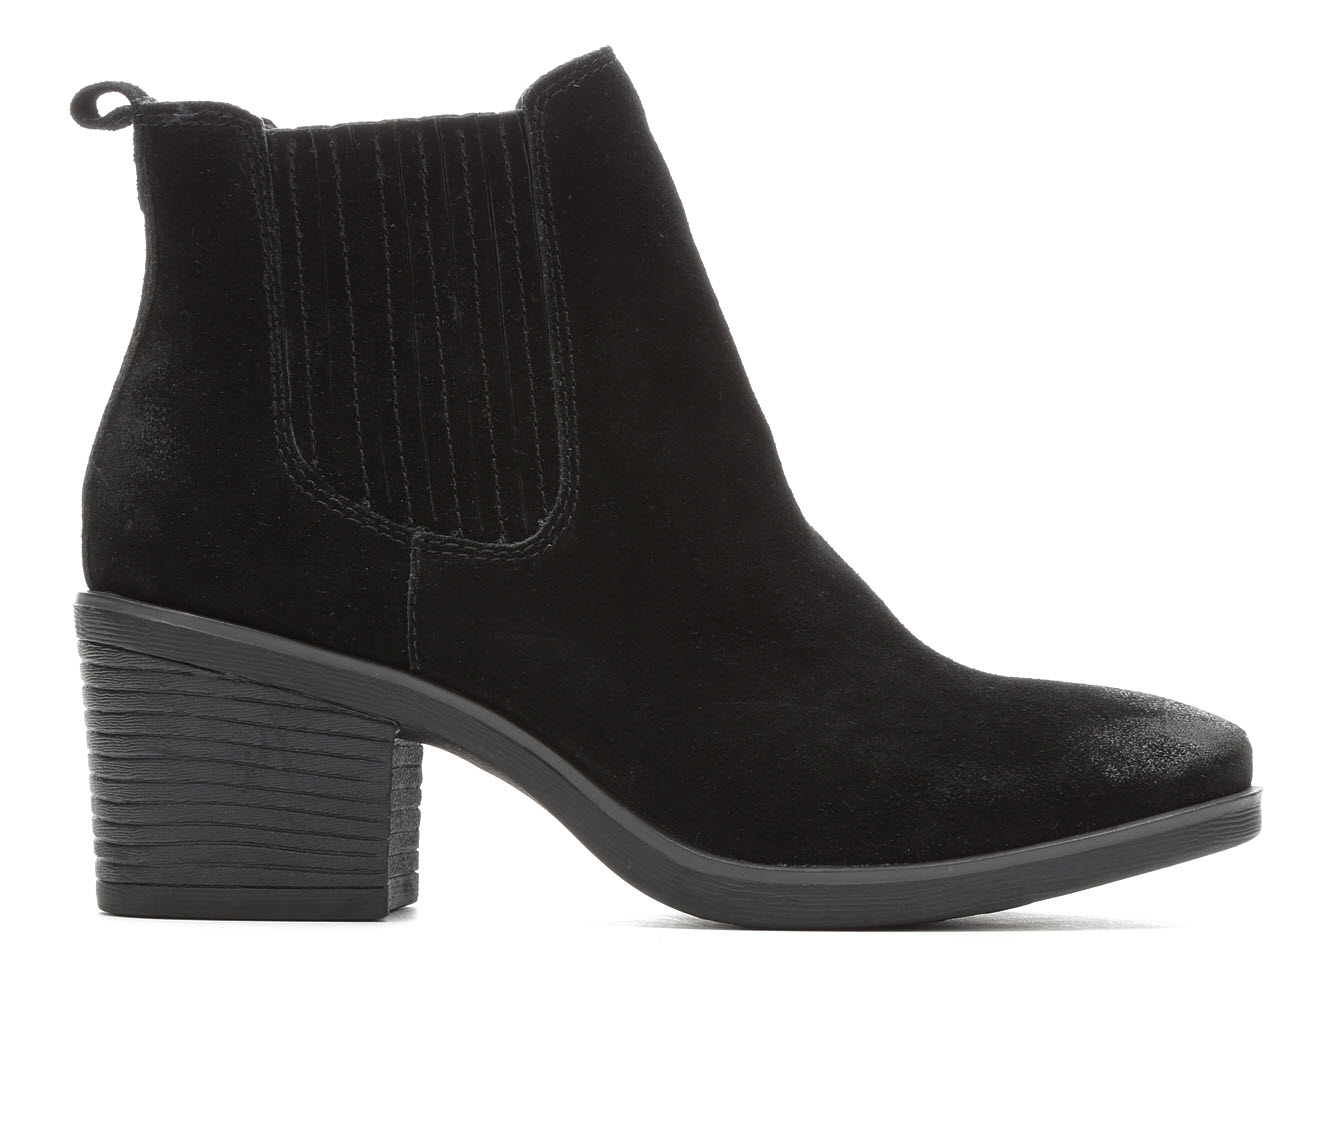 EuroSoft Jennica Women's Boot (Black Suede)